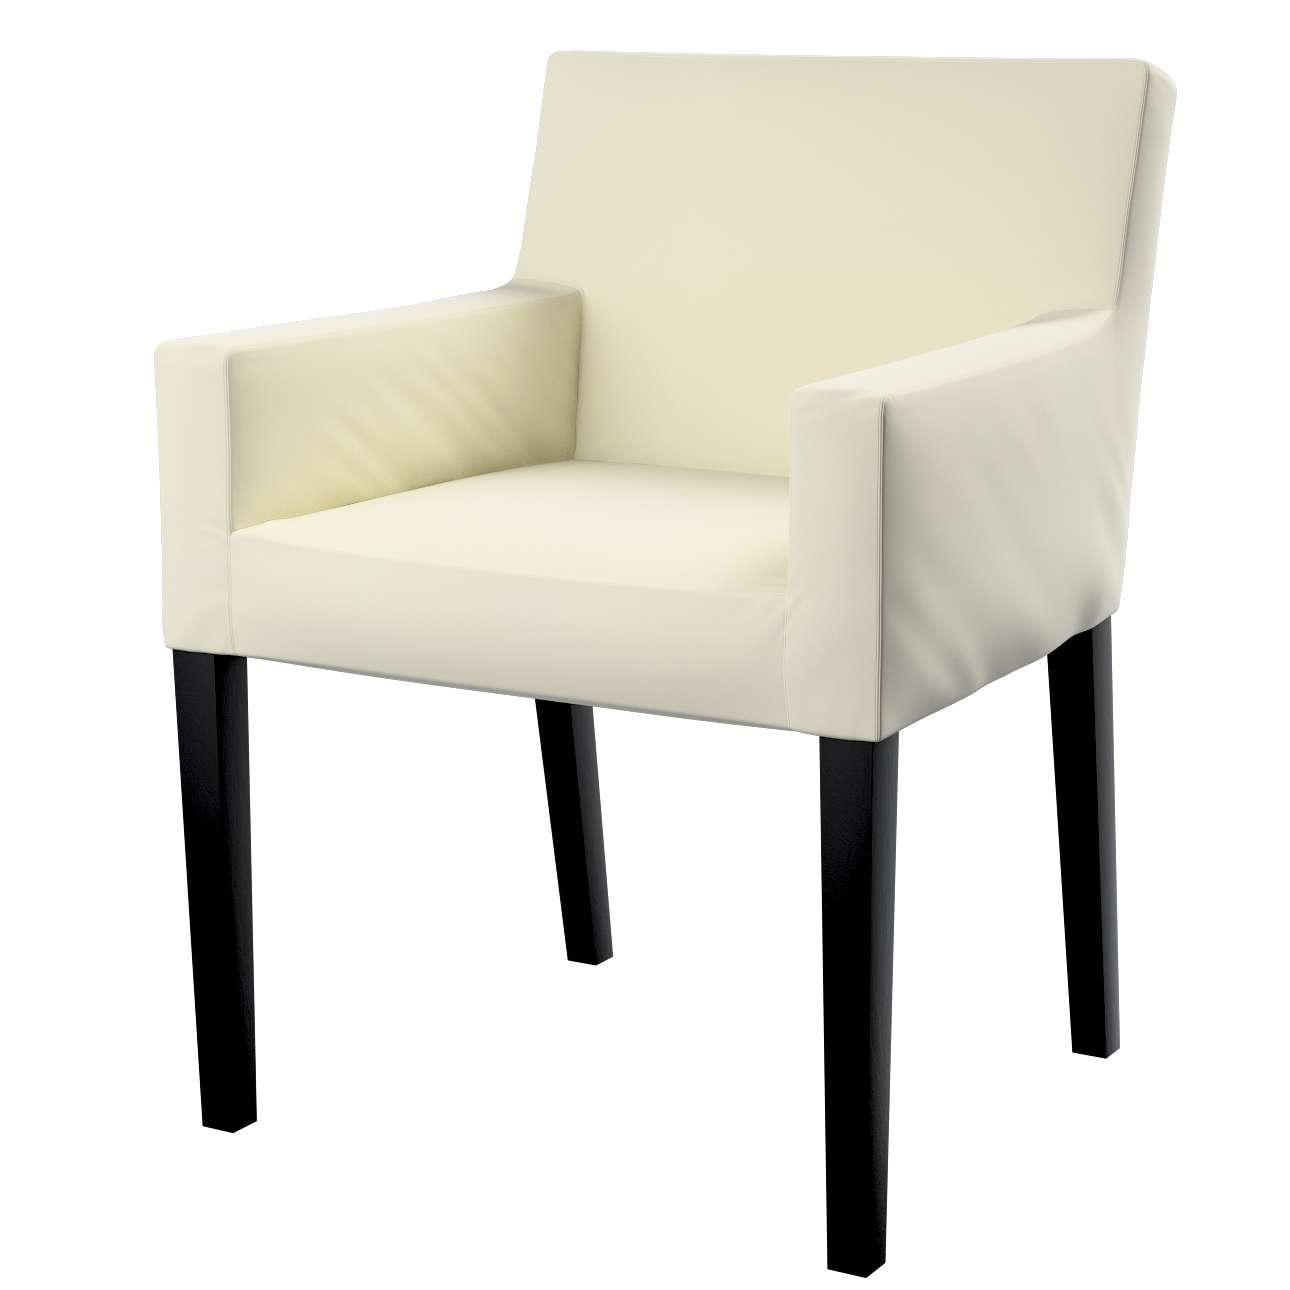 Návlek na stoličku s opierkami Nils V kolekcii Velvet, tkanina: 704-10